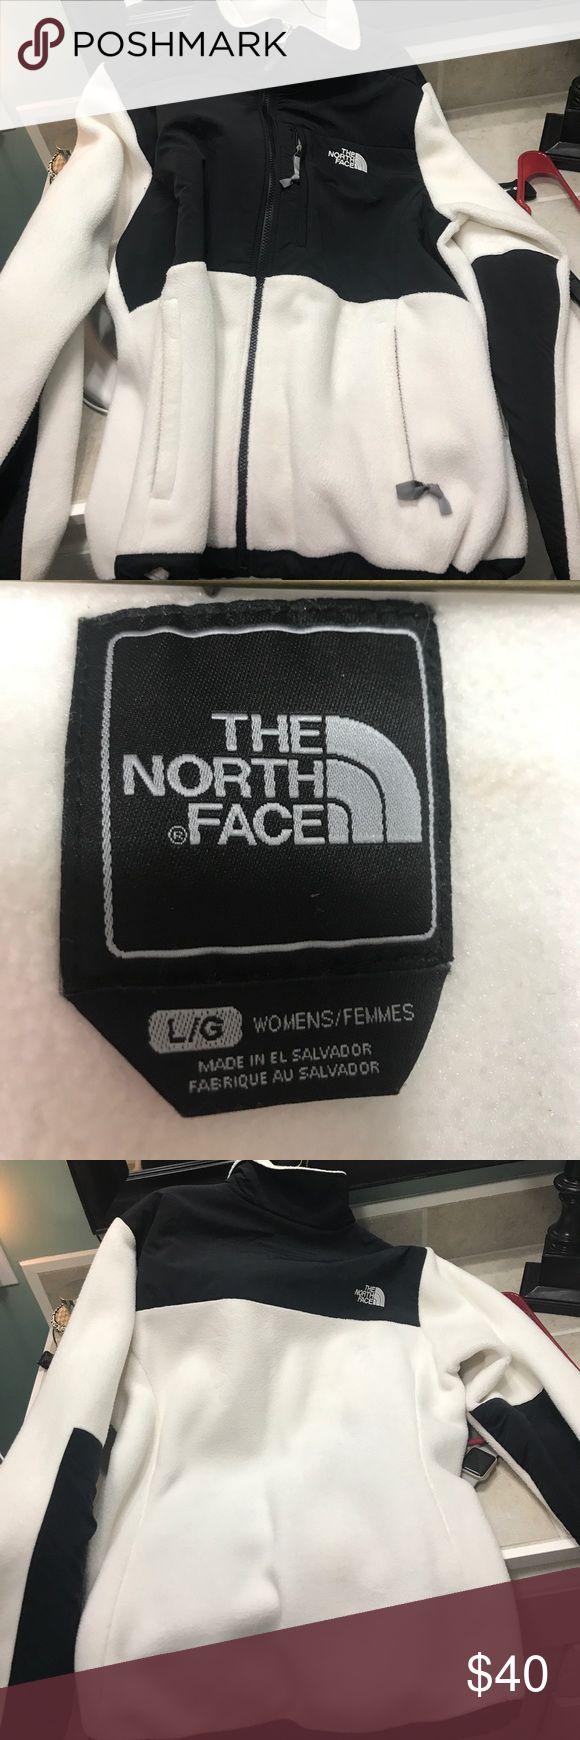 Women's north face jacket Women's large black and white north face North Face Jackets & Coats